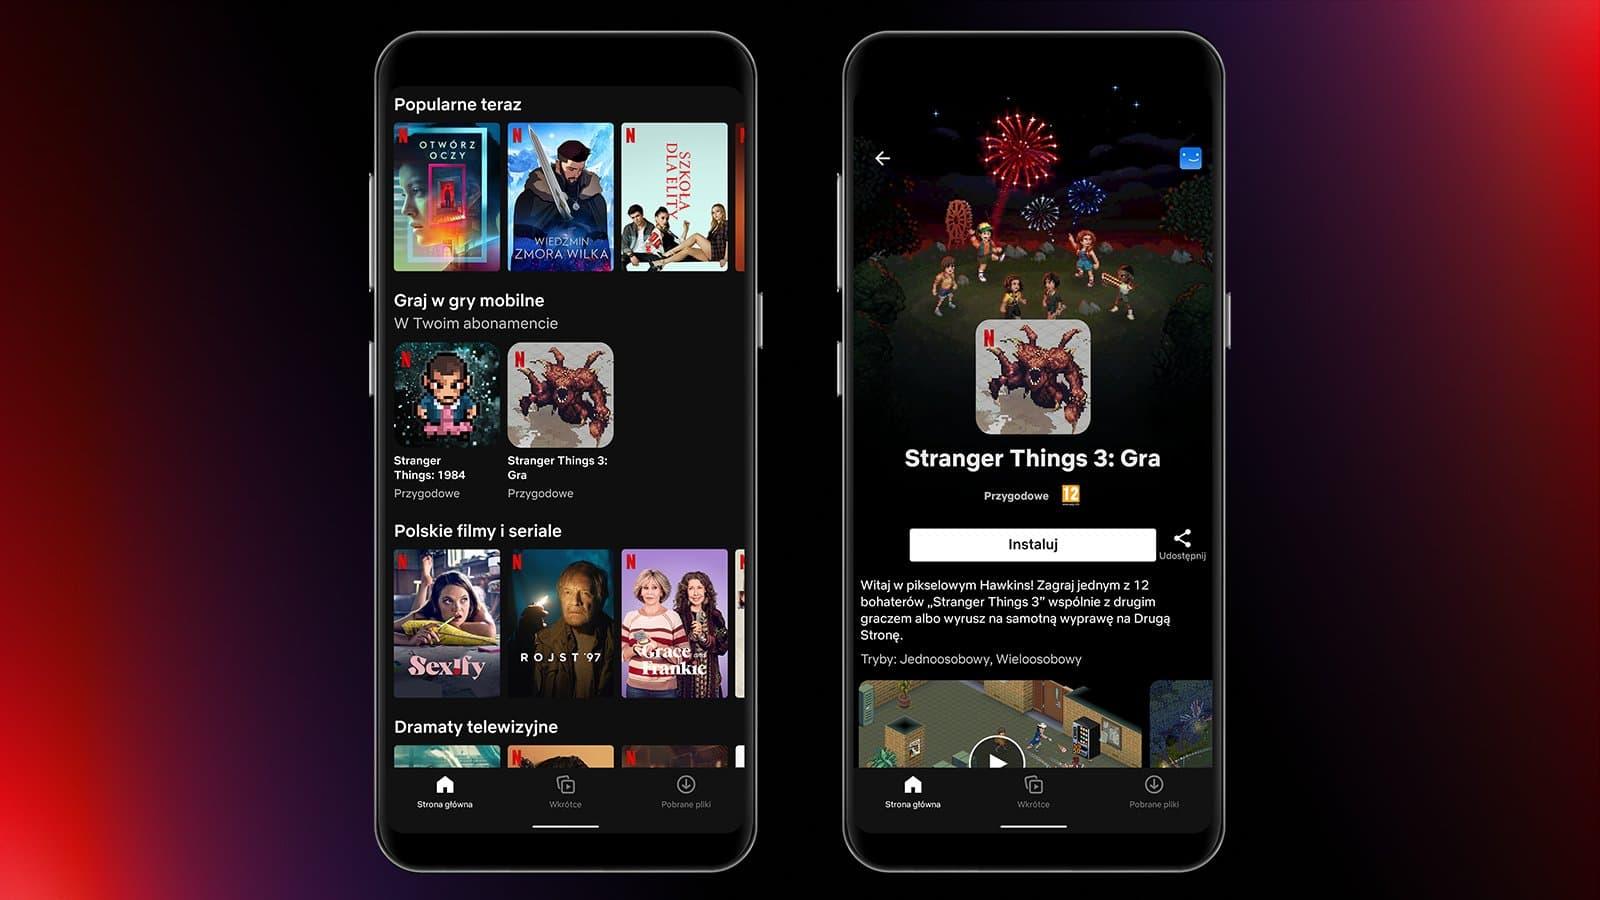 Netflix遊戲正式開放測試!訂閱用戶率先體驗兩款《怪奇物語》手遊2